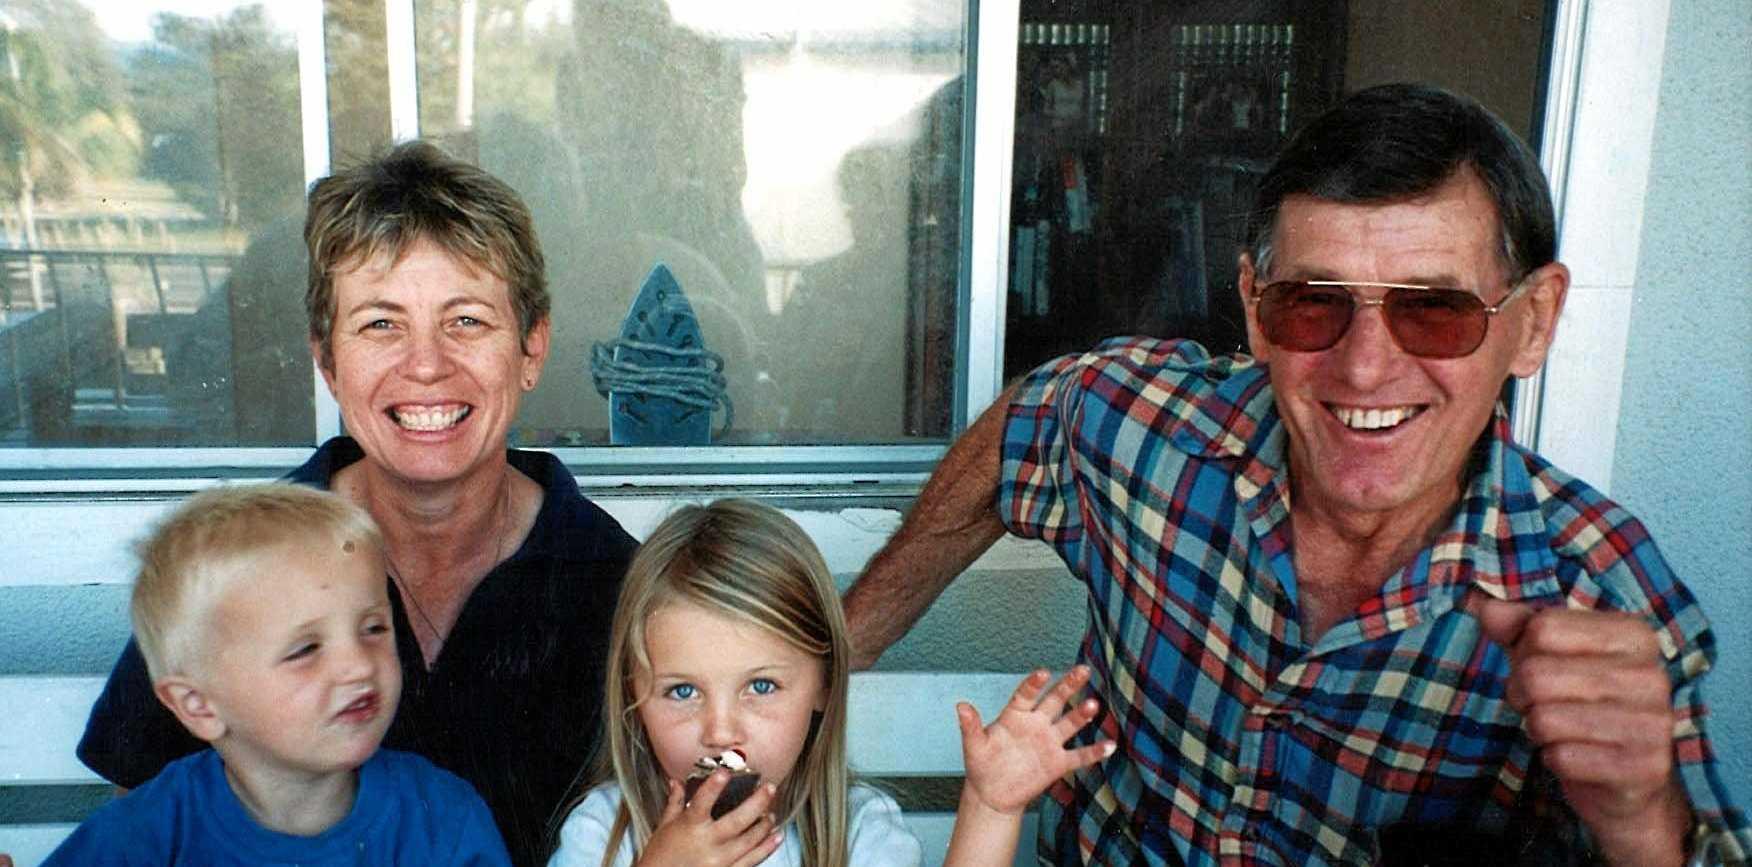 FAMILY MAN: Rhonda Van Ansem-Brooker, her grandchildren Joe and Jess with Tony Van Ansem enjoying family time.